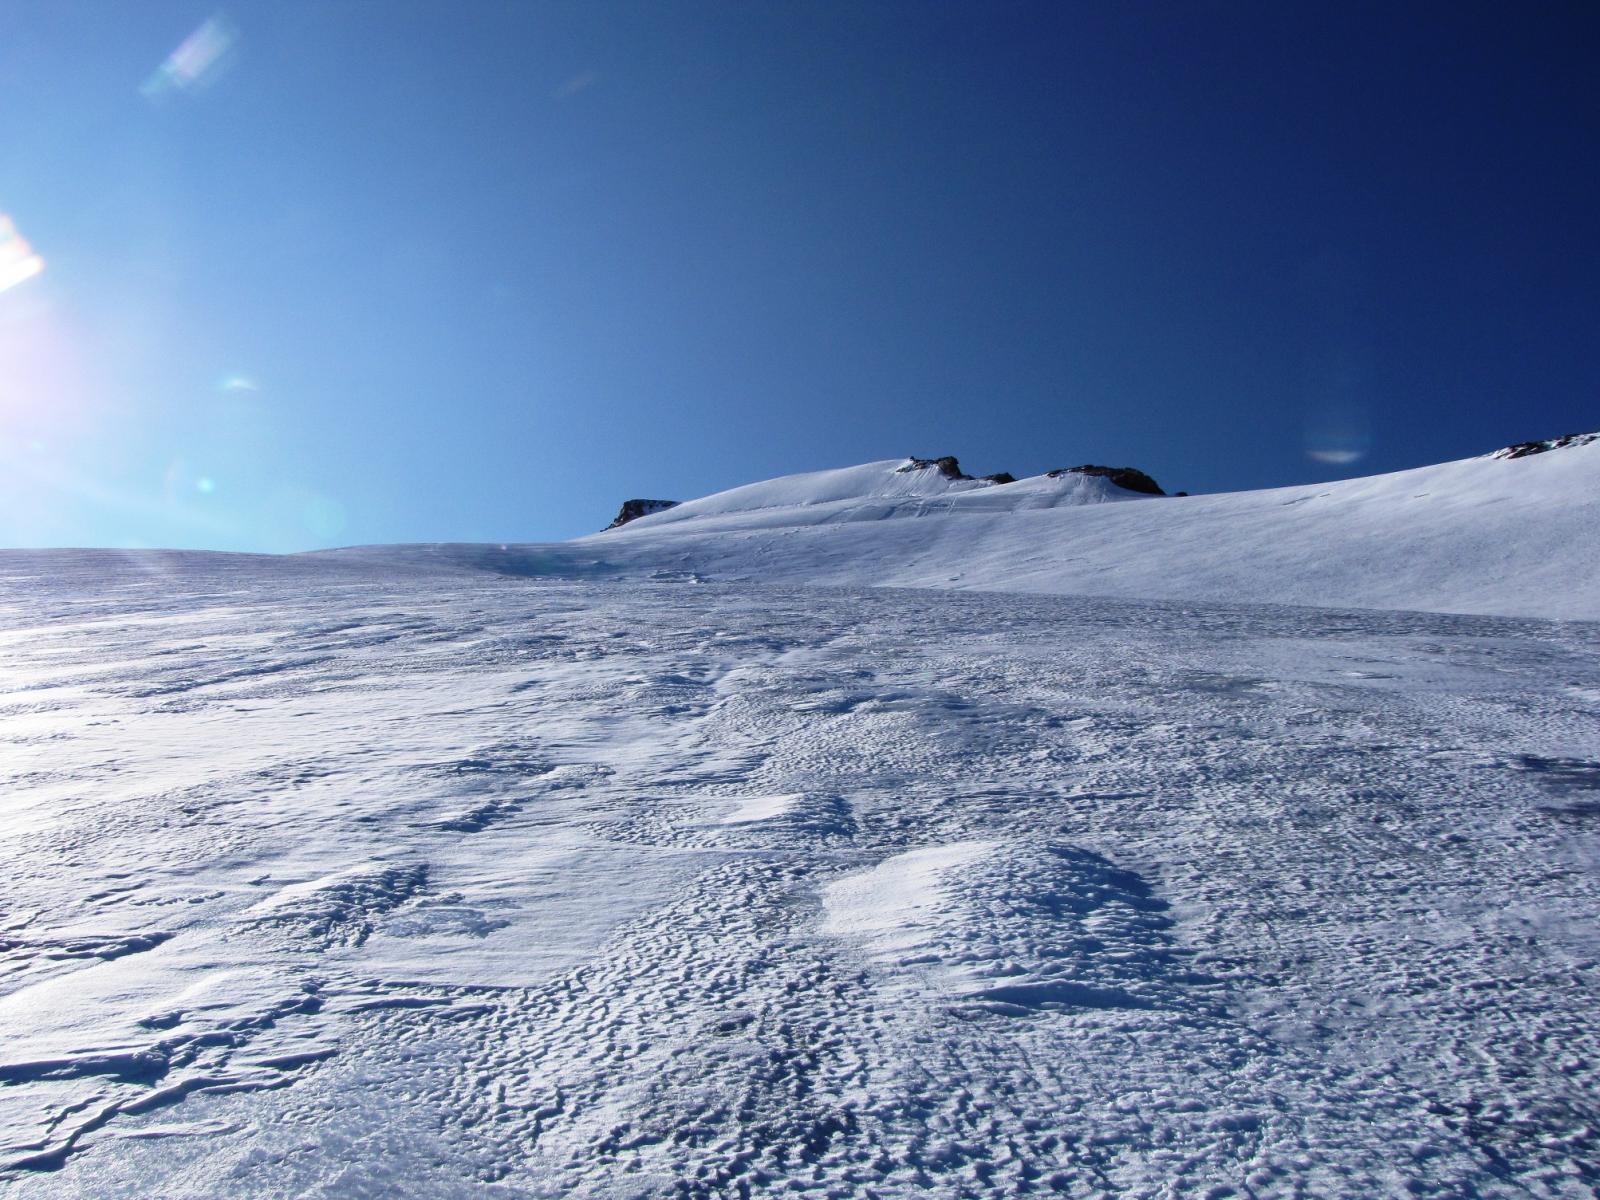 ghiacciaio in ottime condizioni